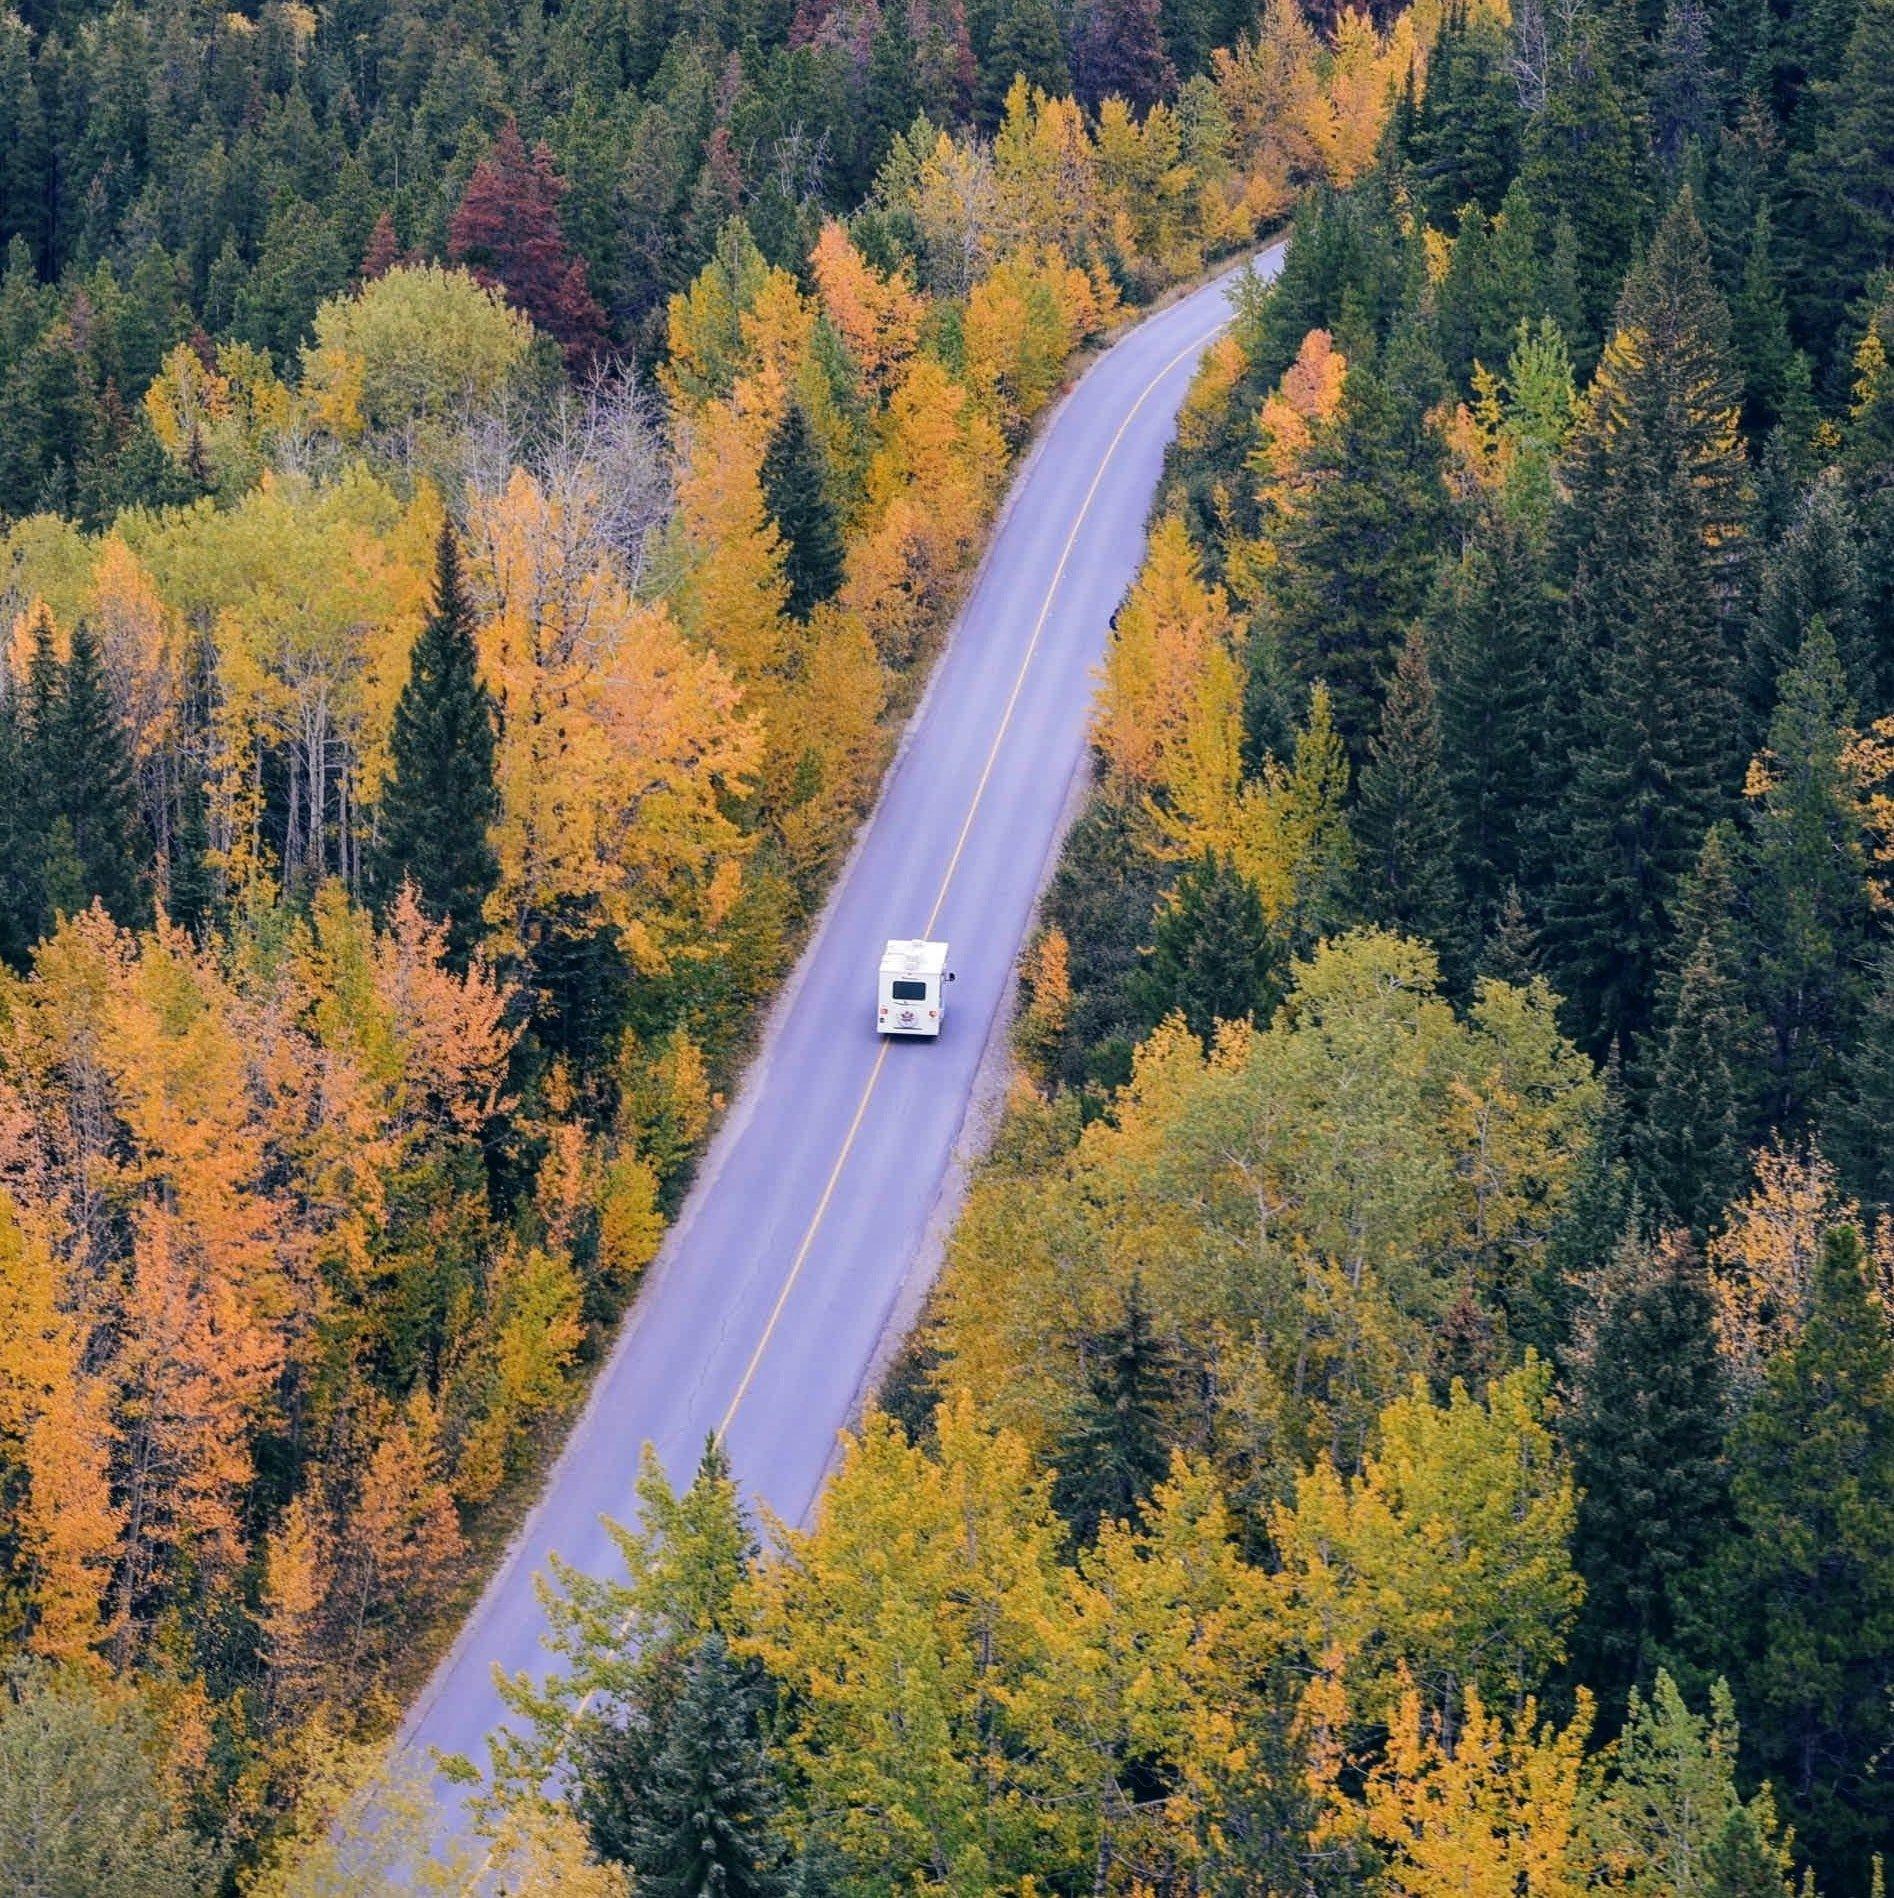 white-car-traveling-near-trees-during-daytime-24698